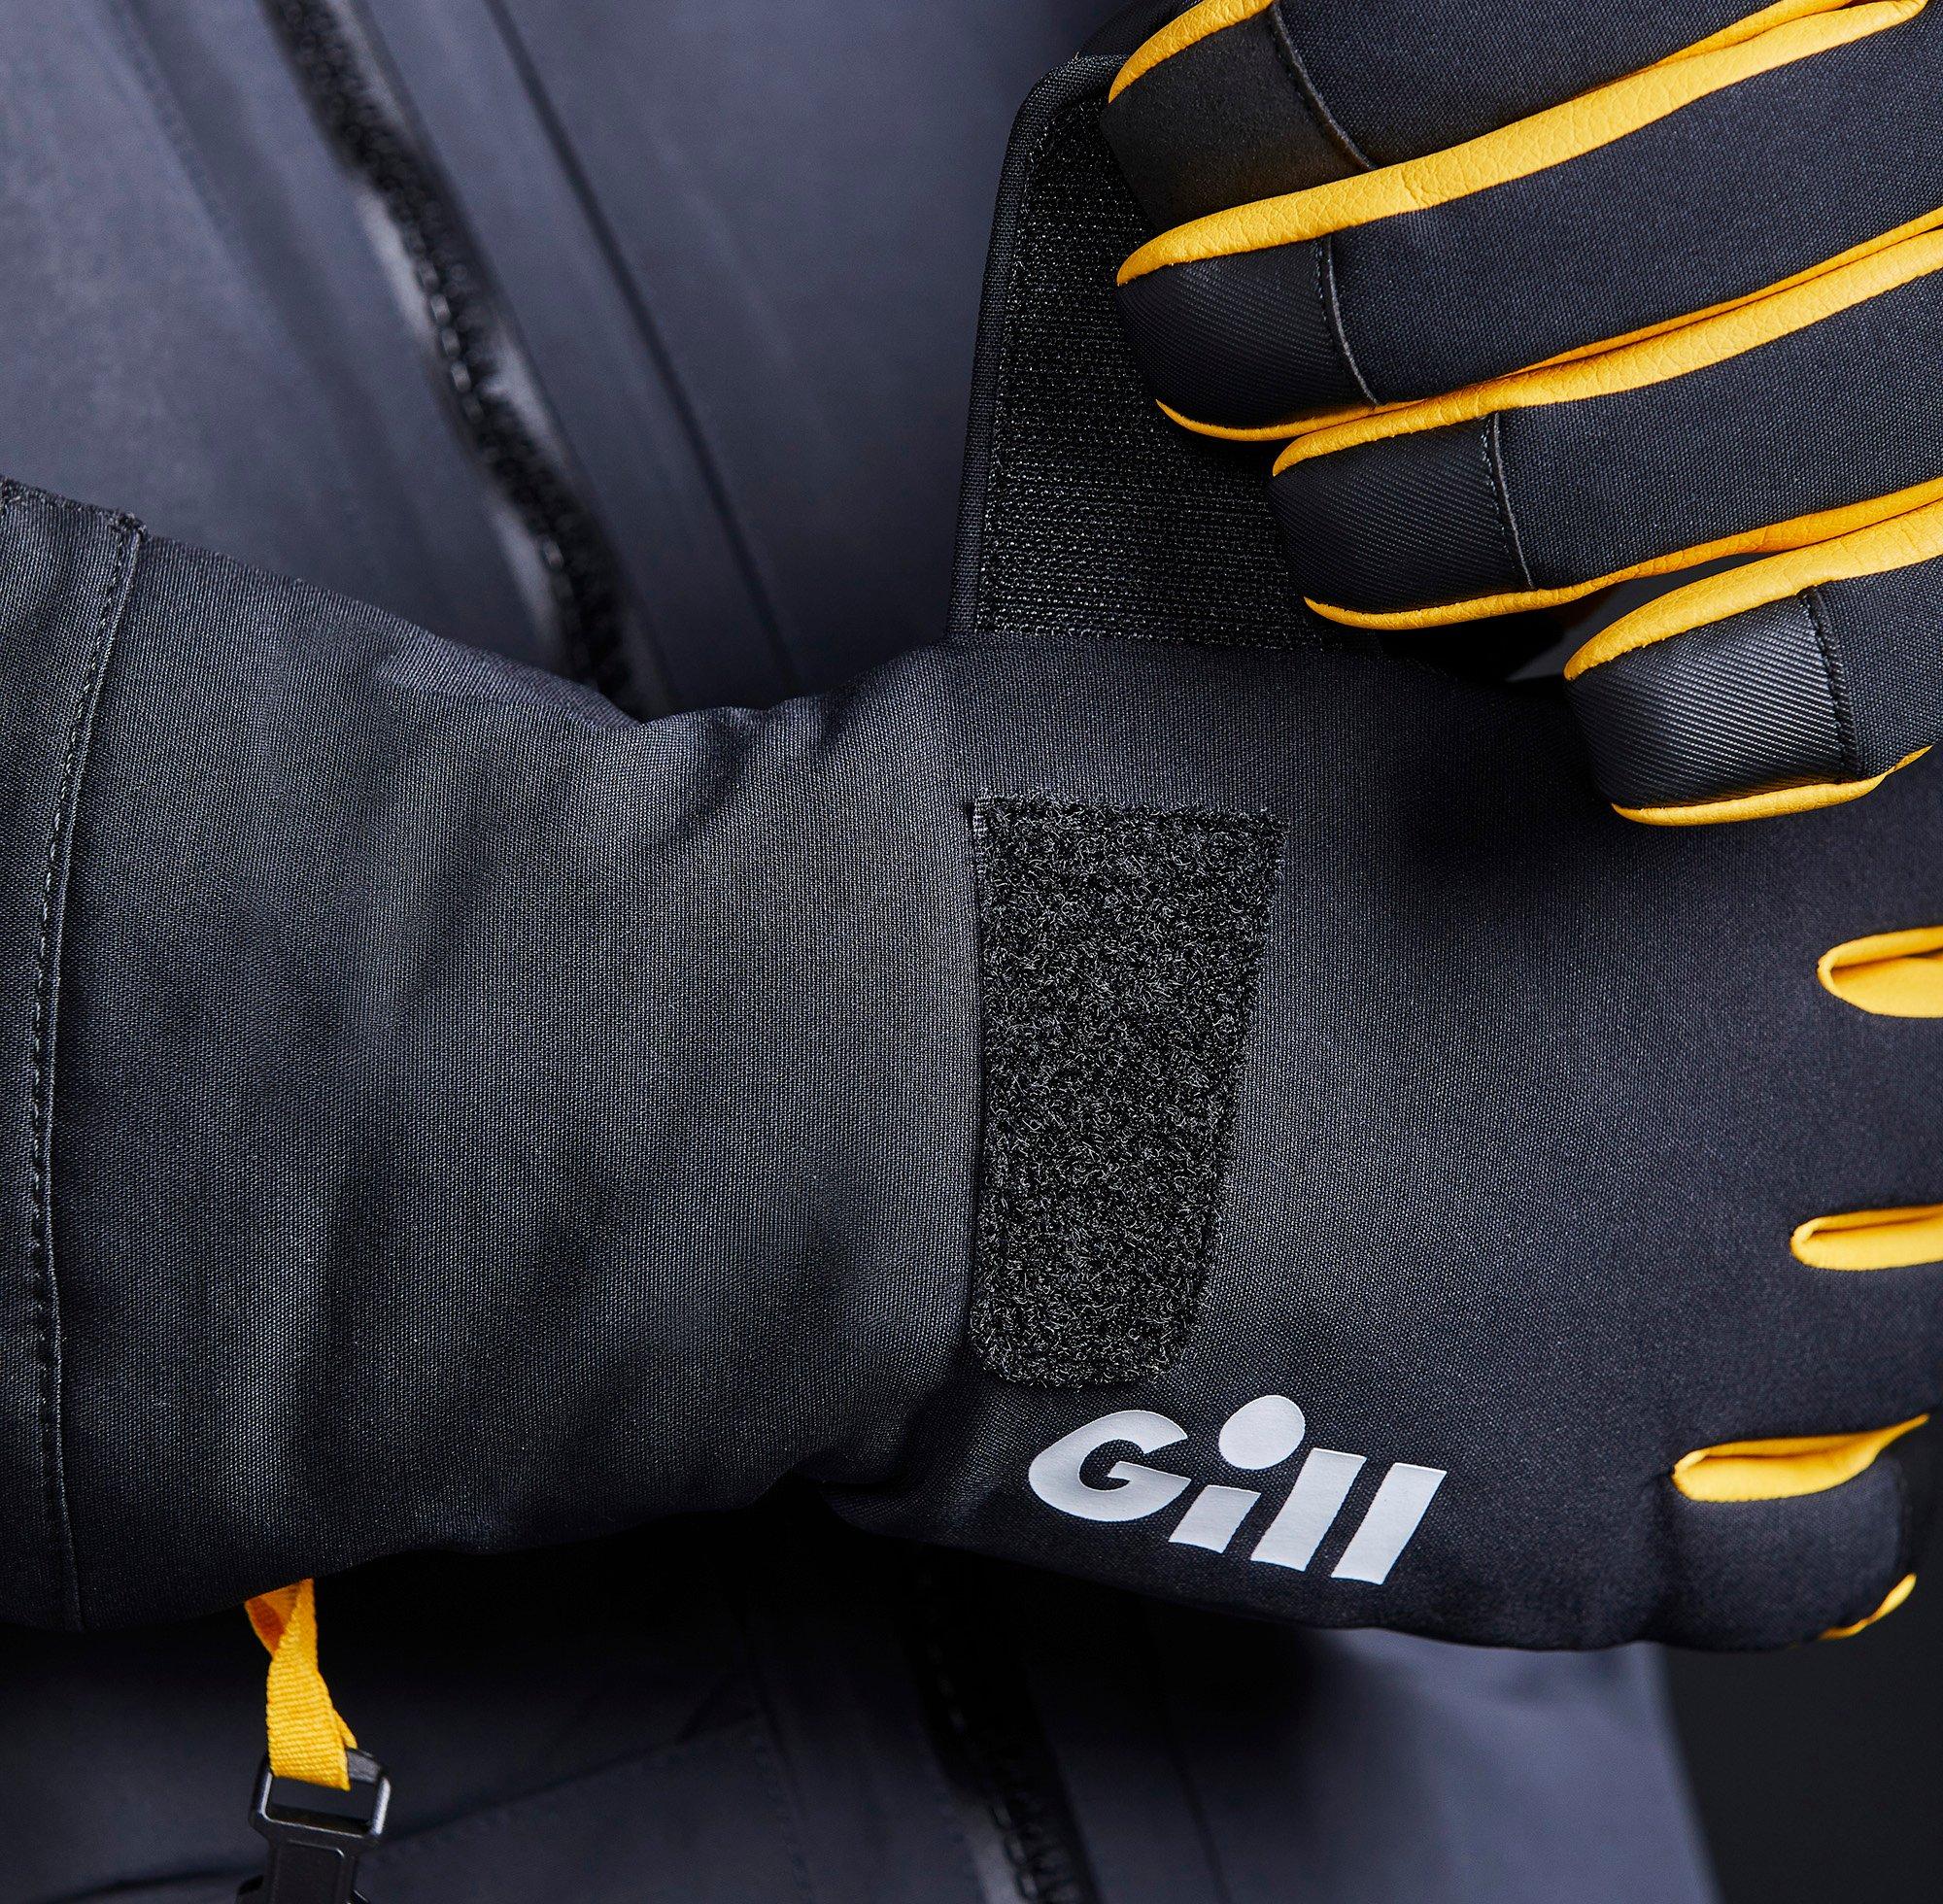 Helmsman-Handschuhe - 7805-BLK01-MODEL_4.jpg